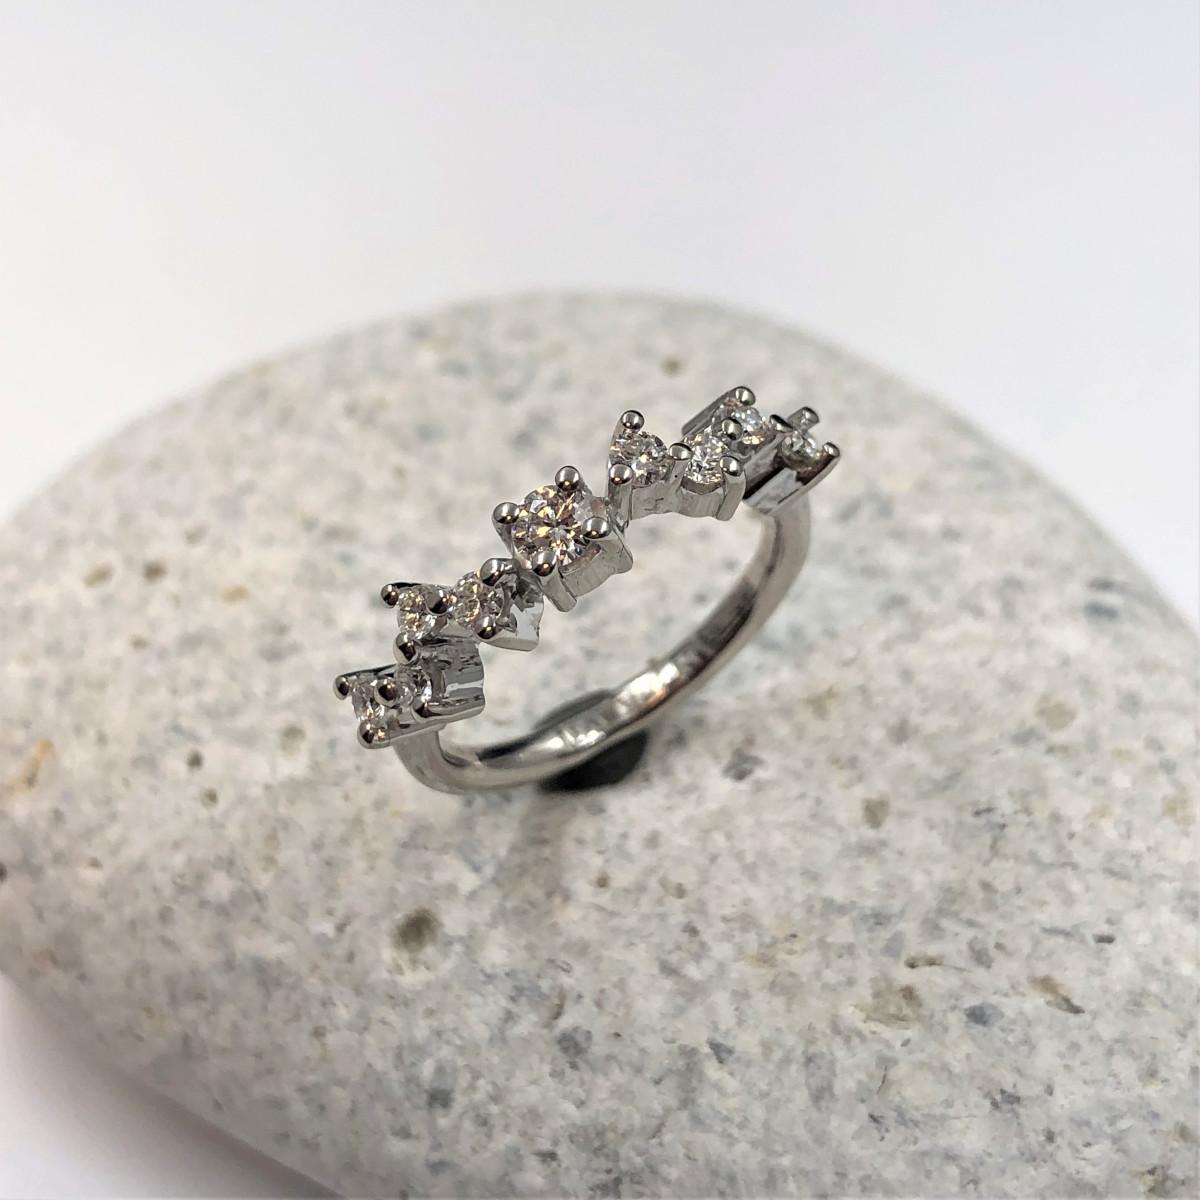 Vitguldsring, briljantring, diamantring